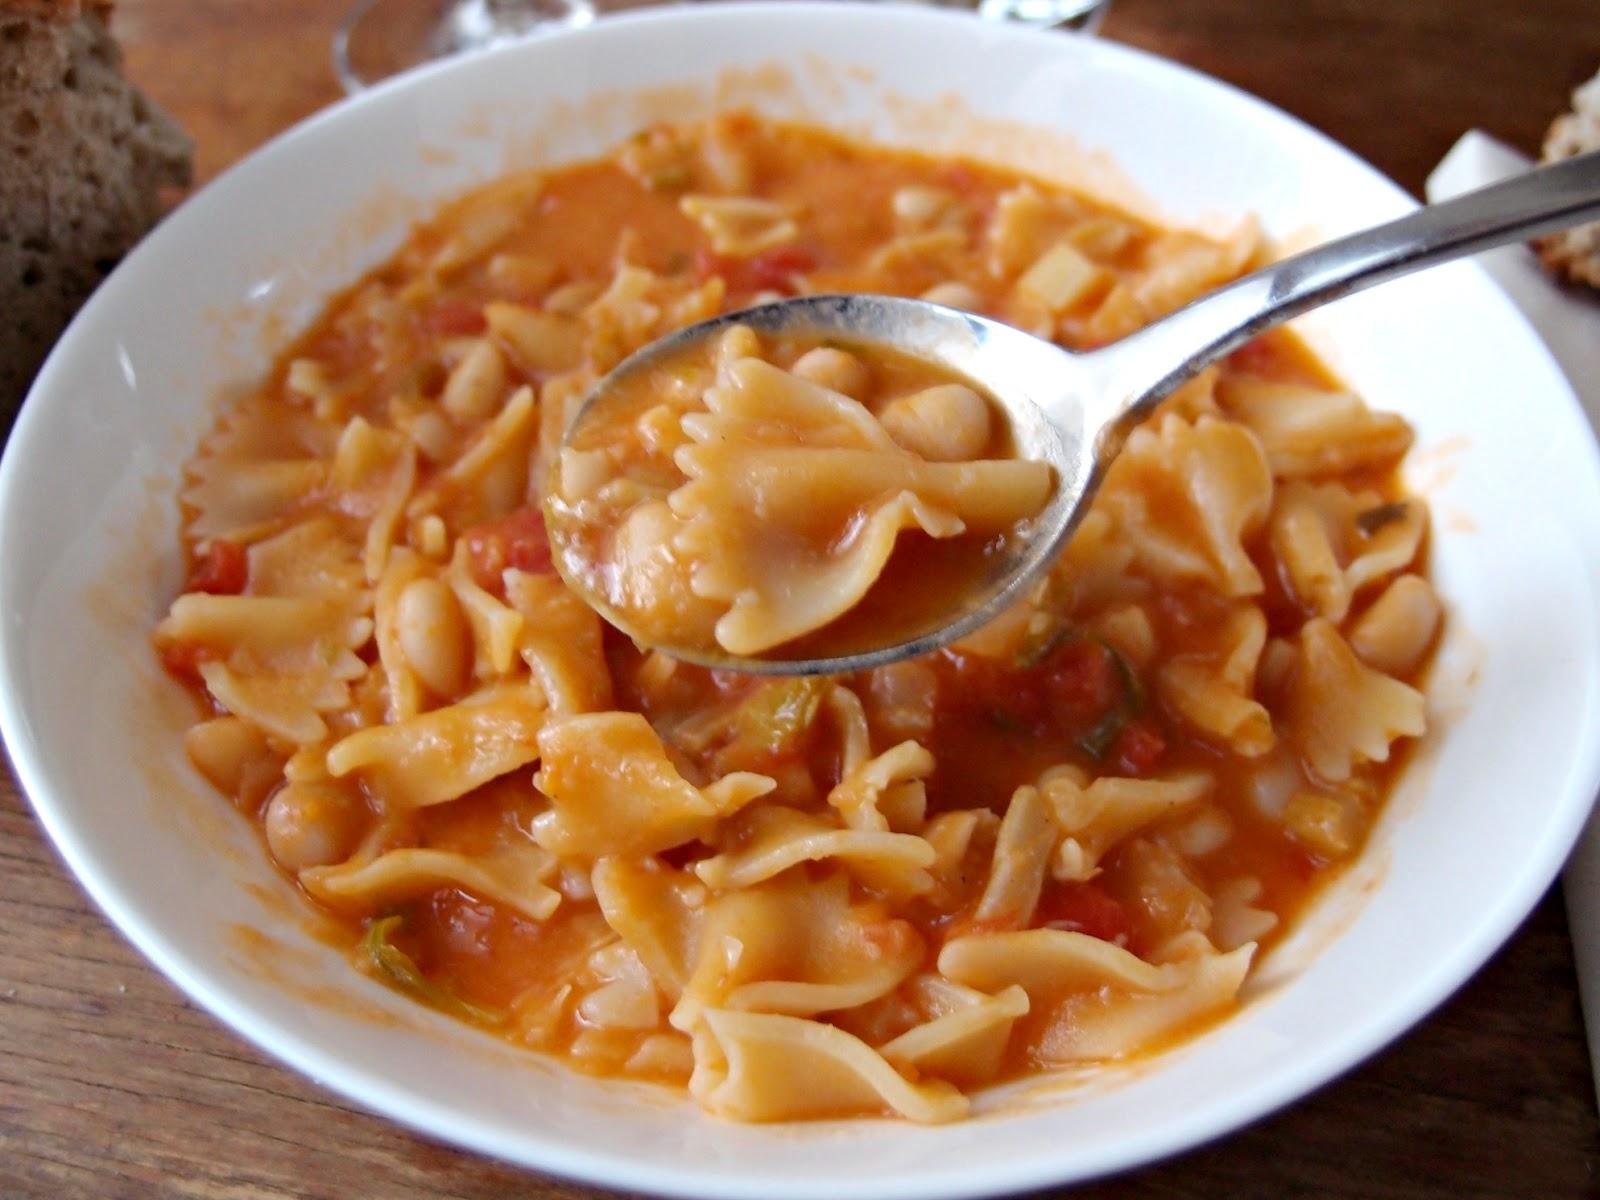 Sopranos recipe for pasta fagioli